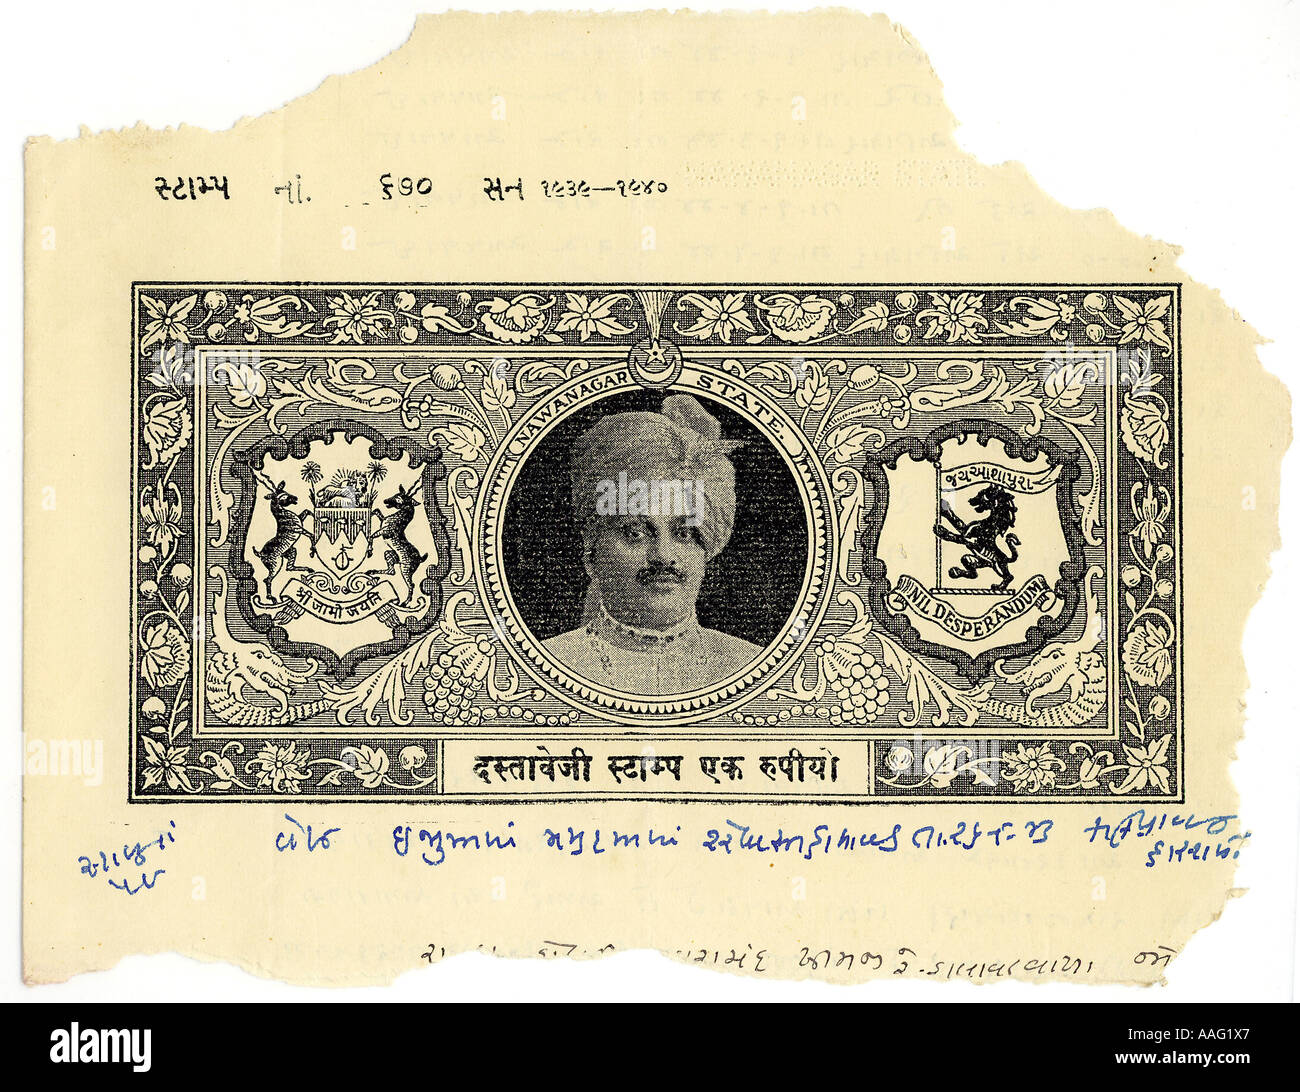 DDR78446 Old Antique Stamp Paper One Rupee 26 August 1943 Nawanagar Or Jamnagar Saurashtra Gujarat India